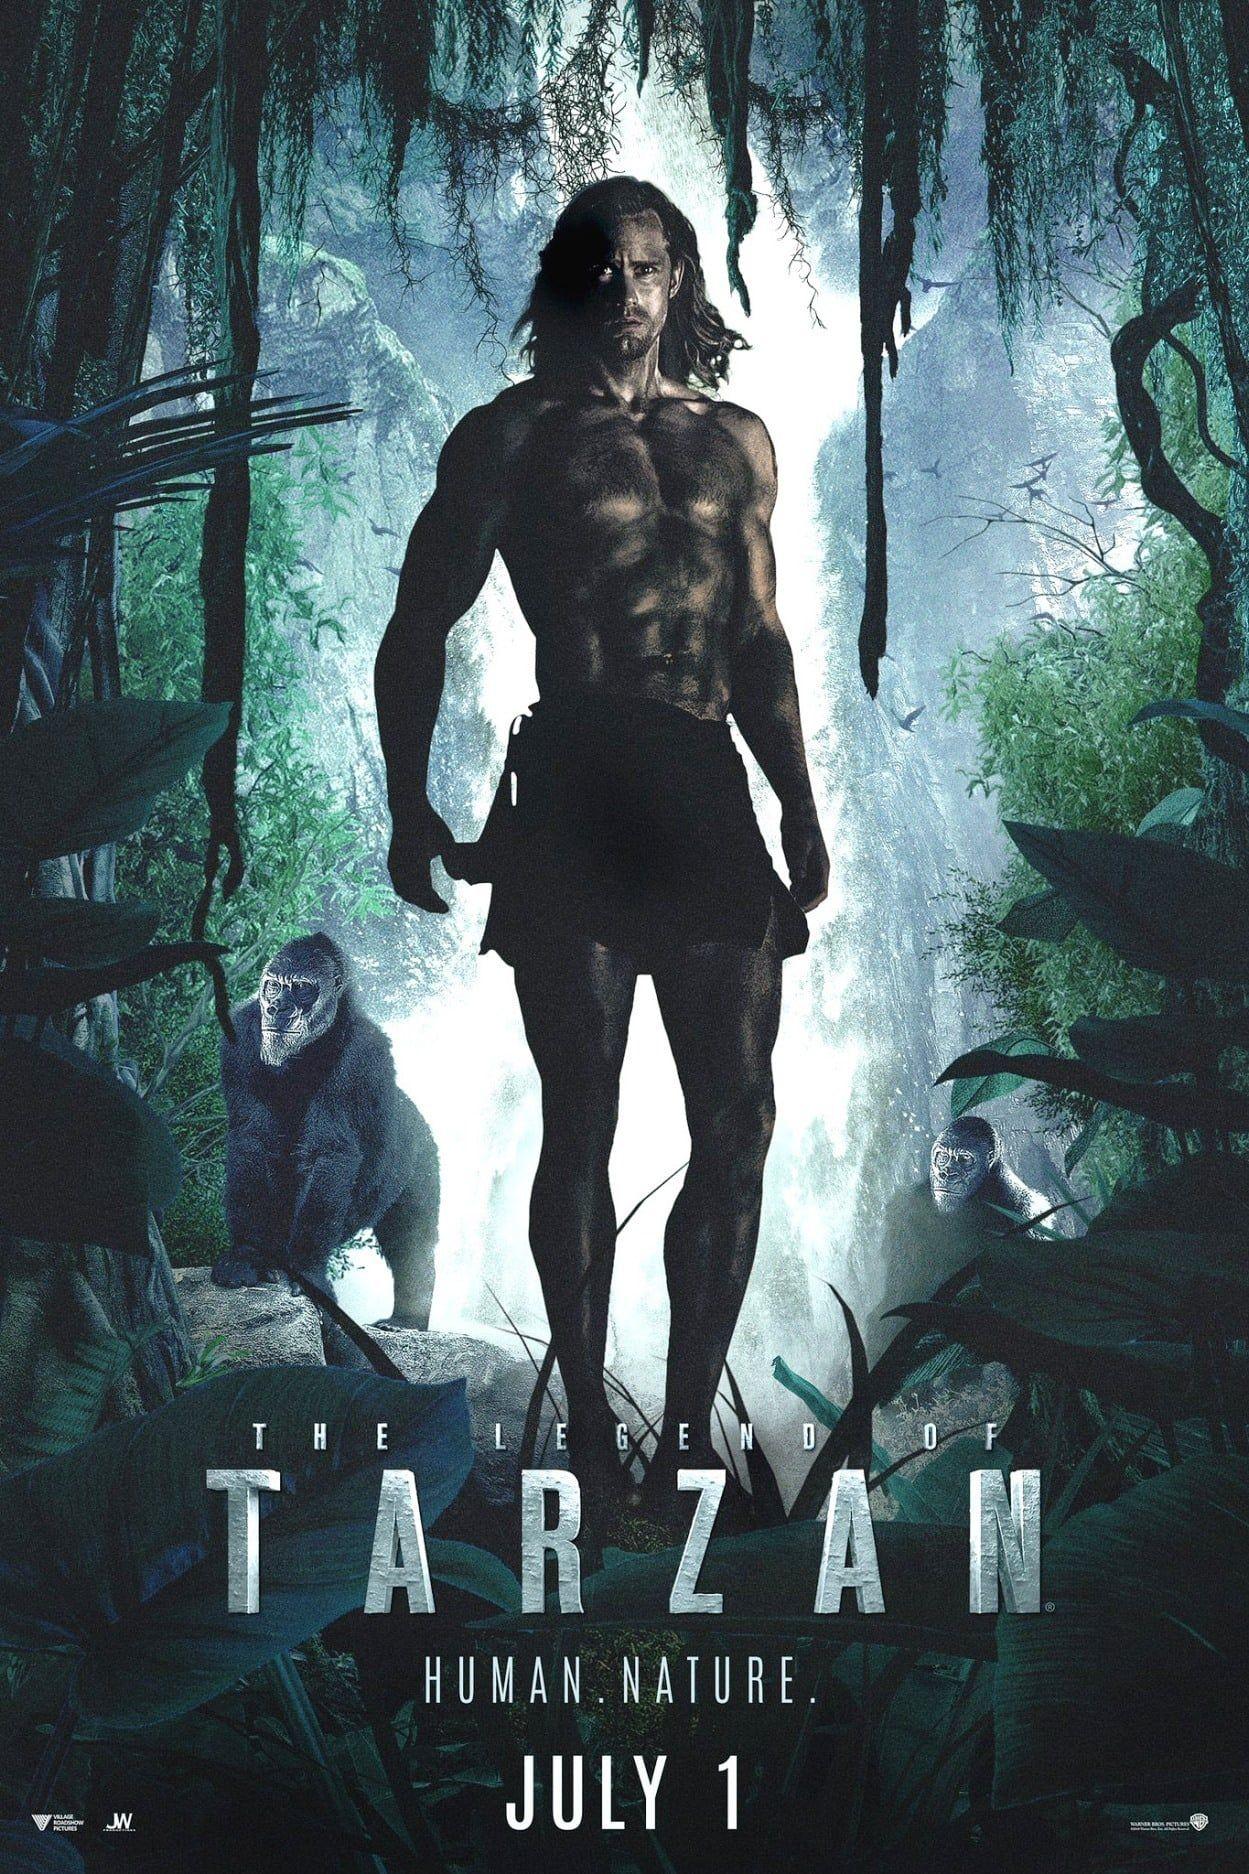 The legend of tarzan FULL MOVIE hdp sub english play